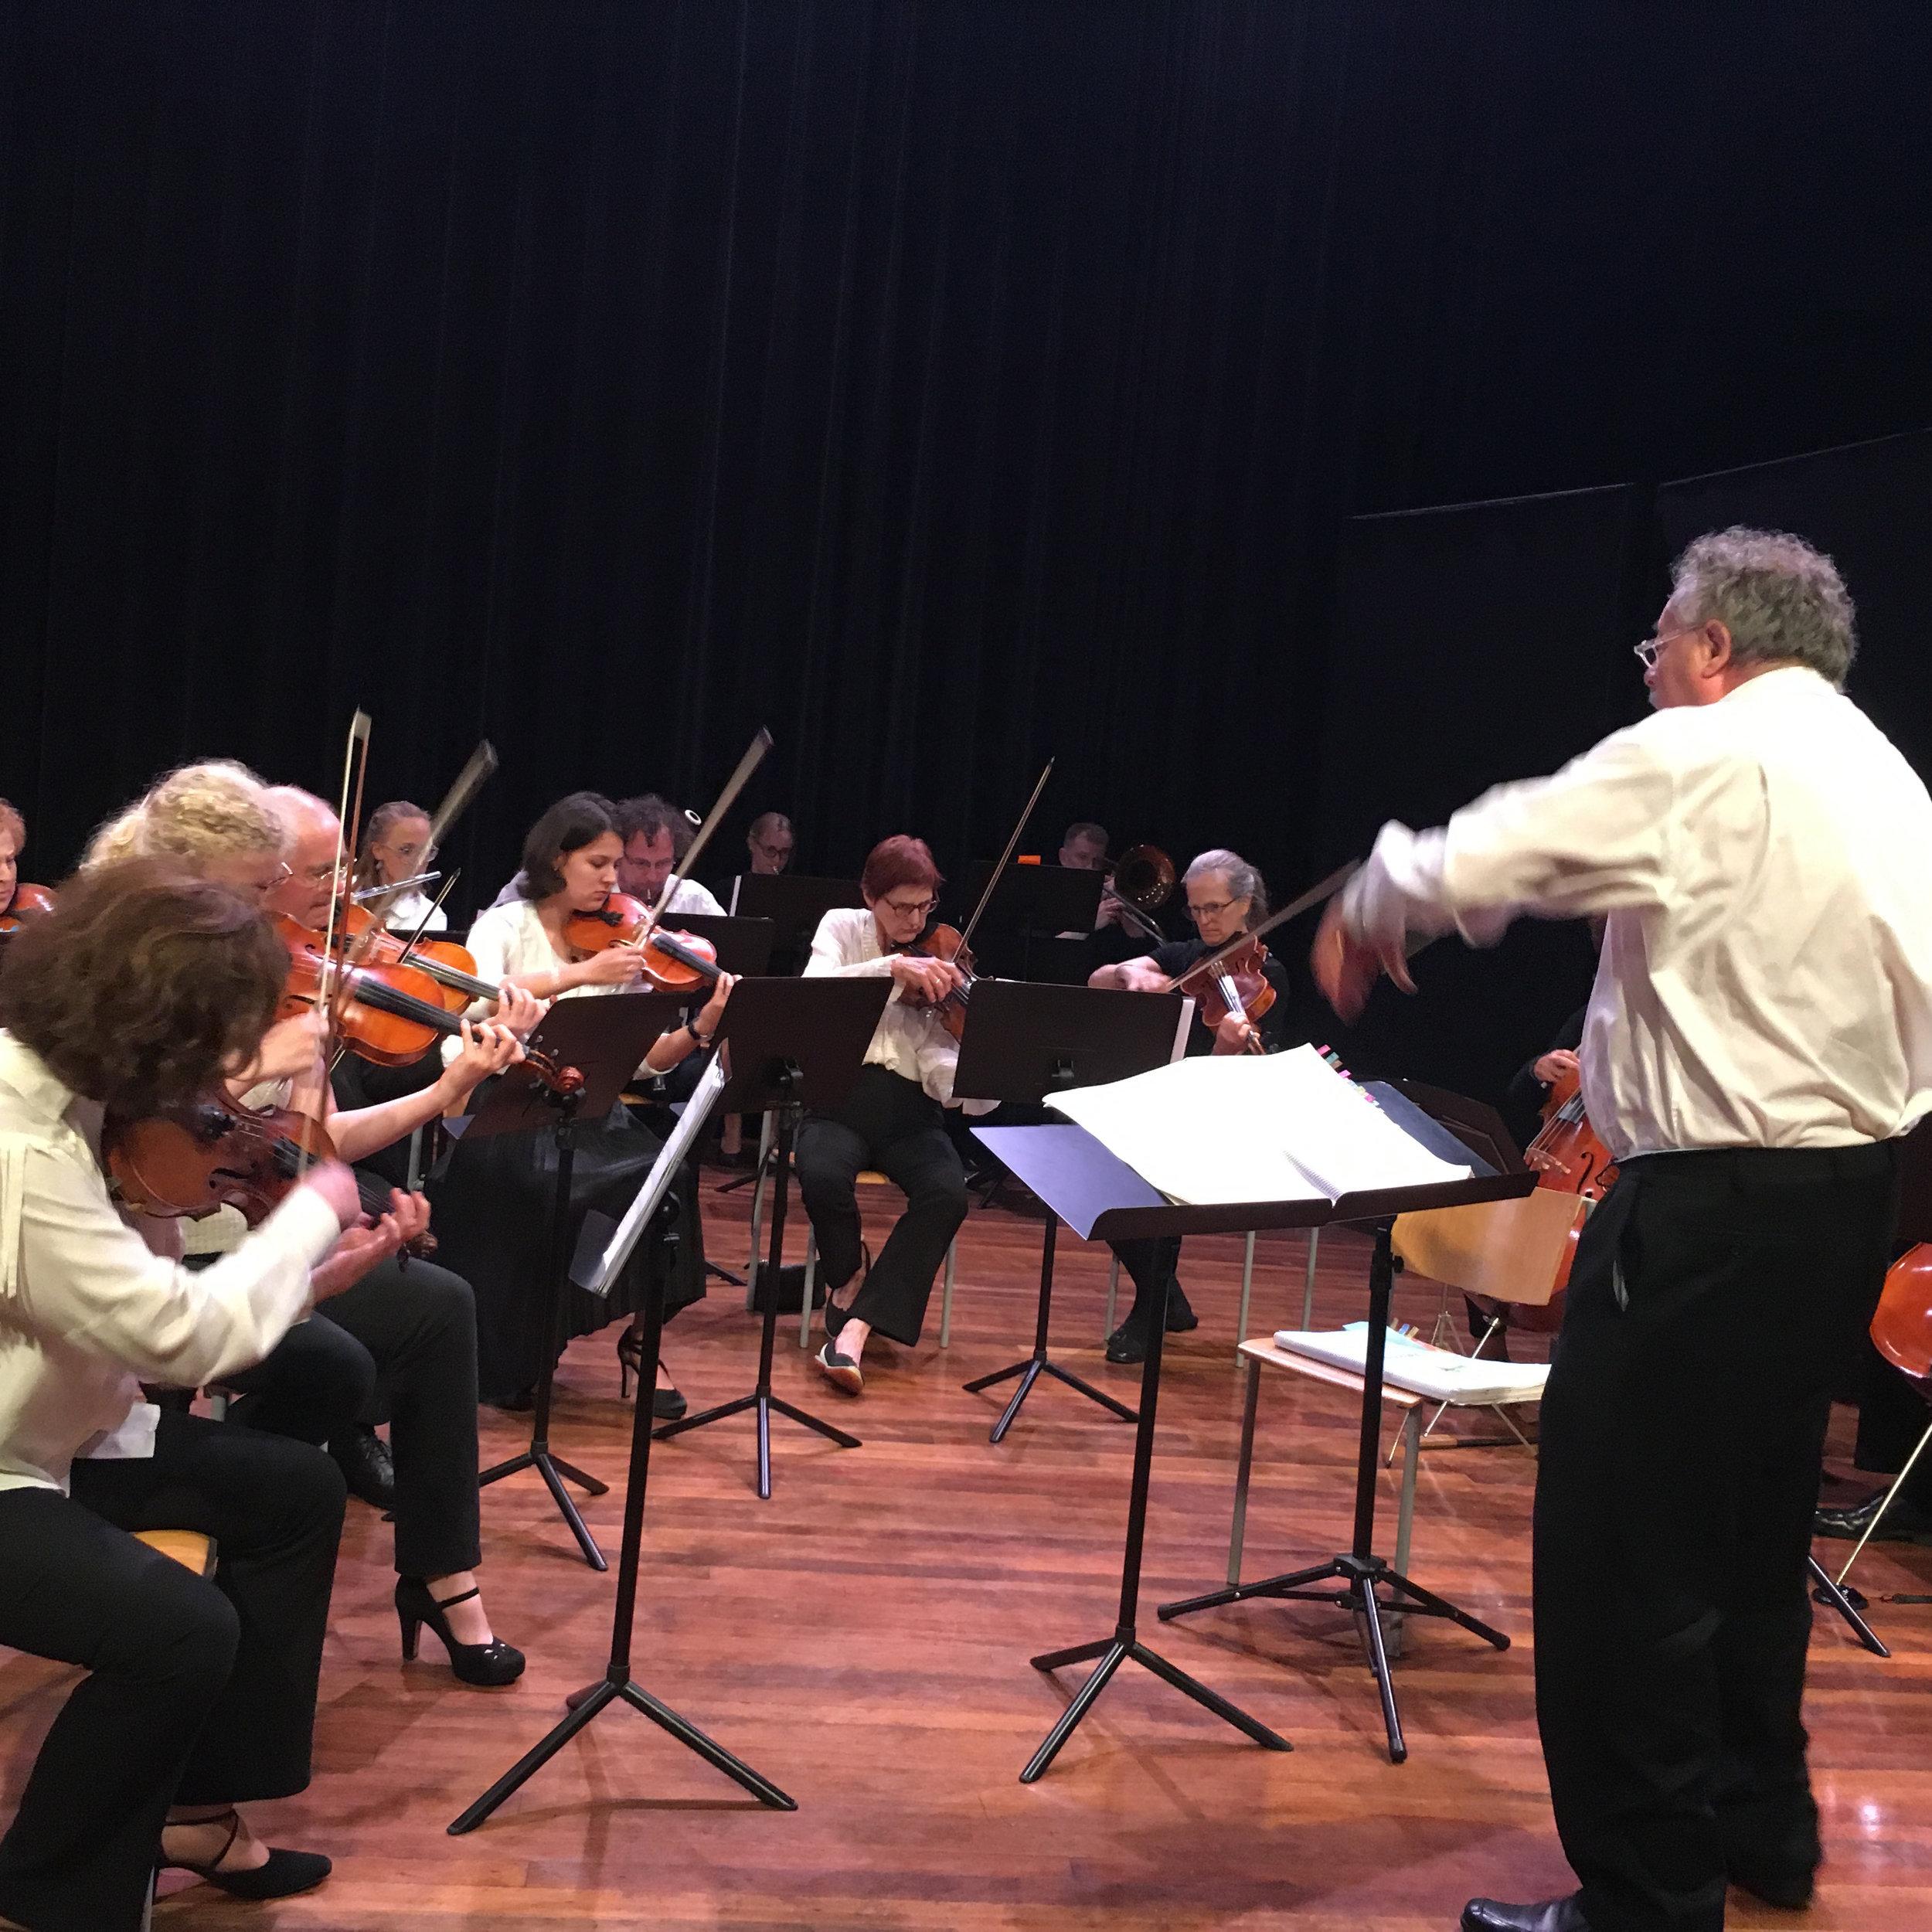 Allegro-orchestra3-sq.jpg